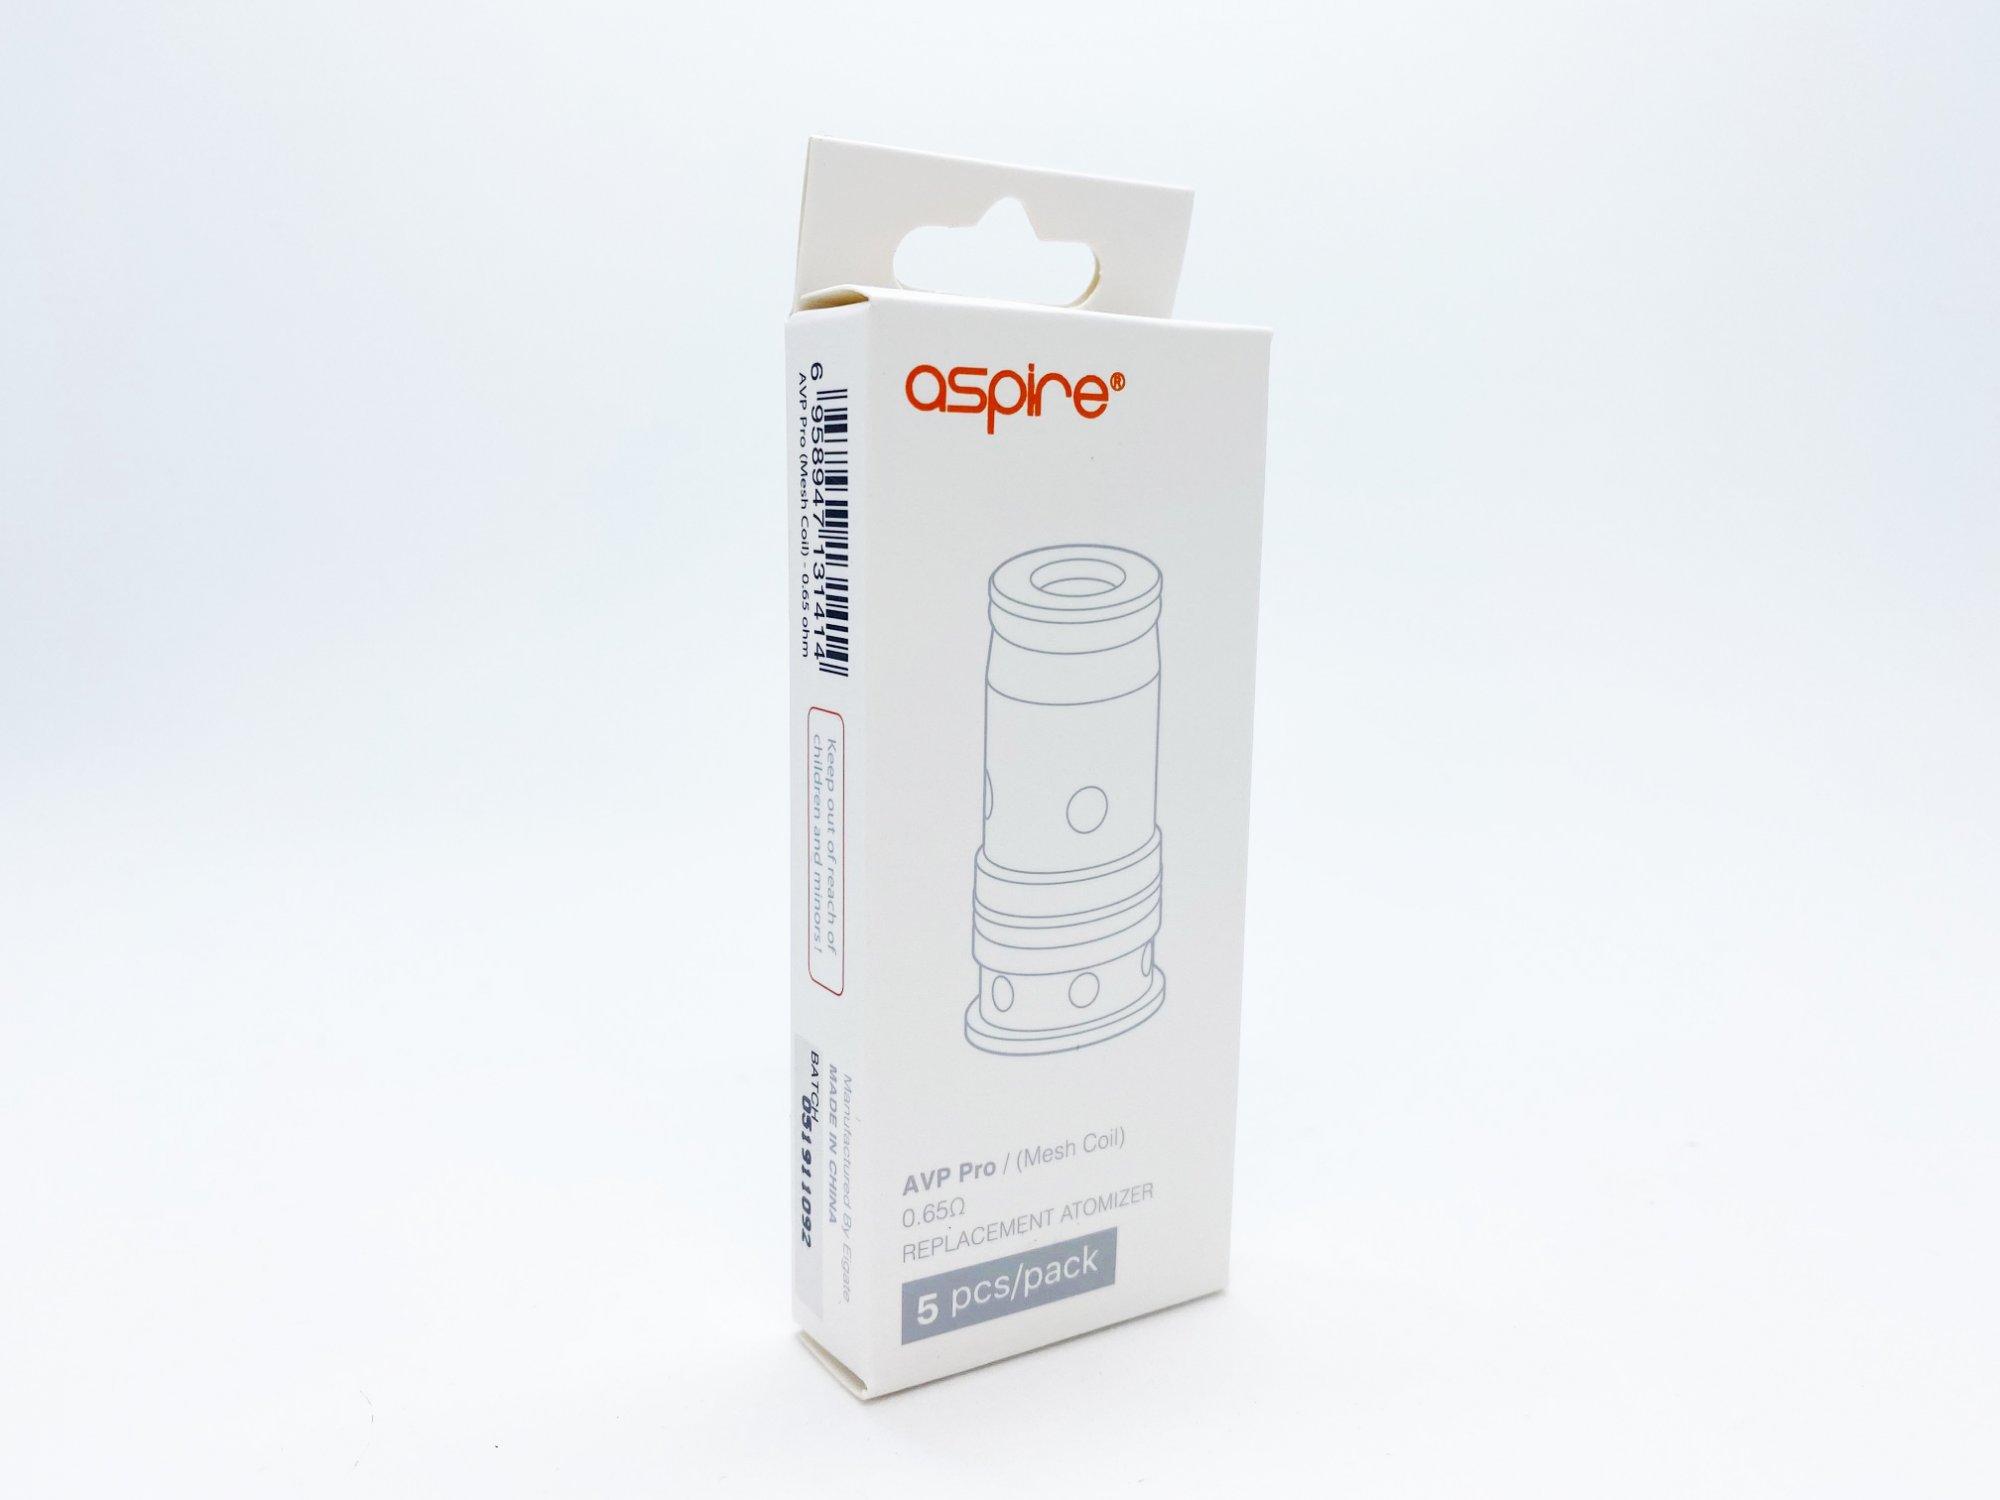 Aspire AVP Pro Coil